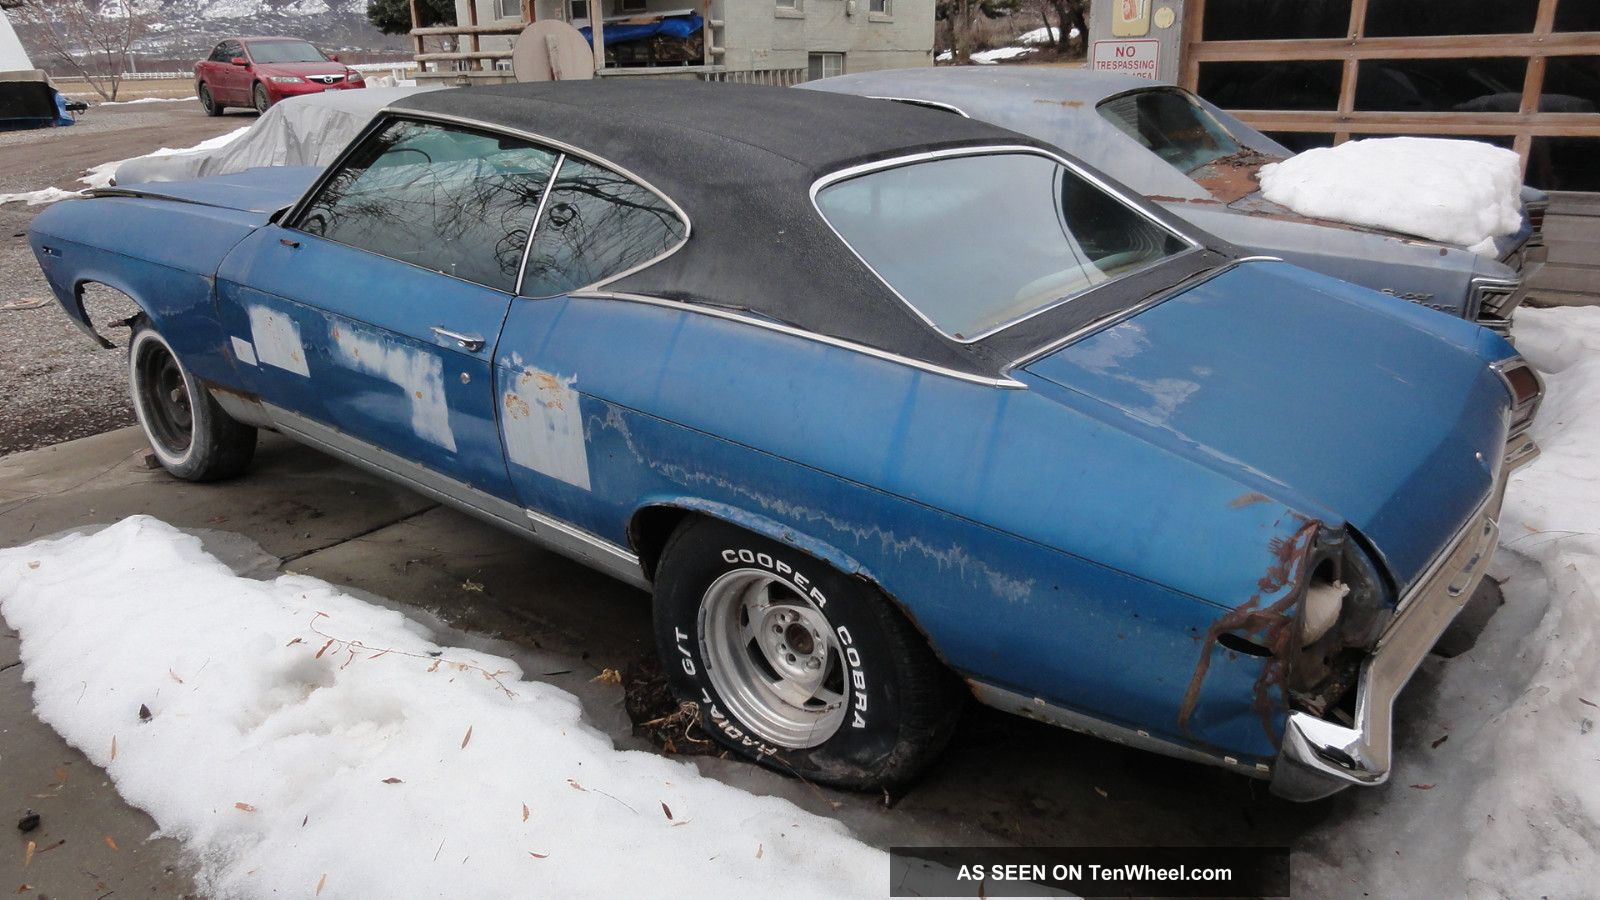 Builder 1969 Chevelle Malibu 2 Door Blue Solid 1968 1970